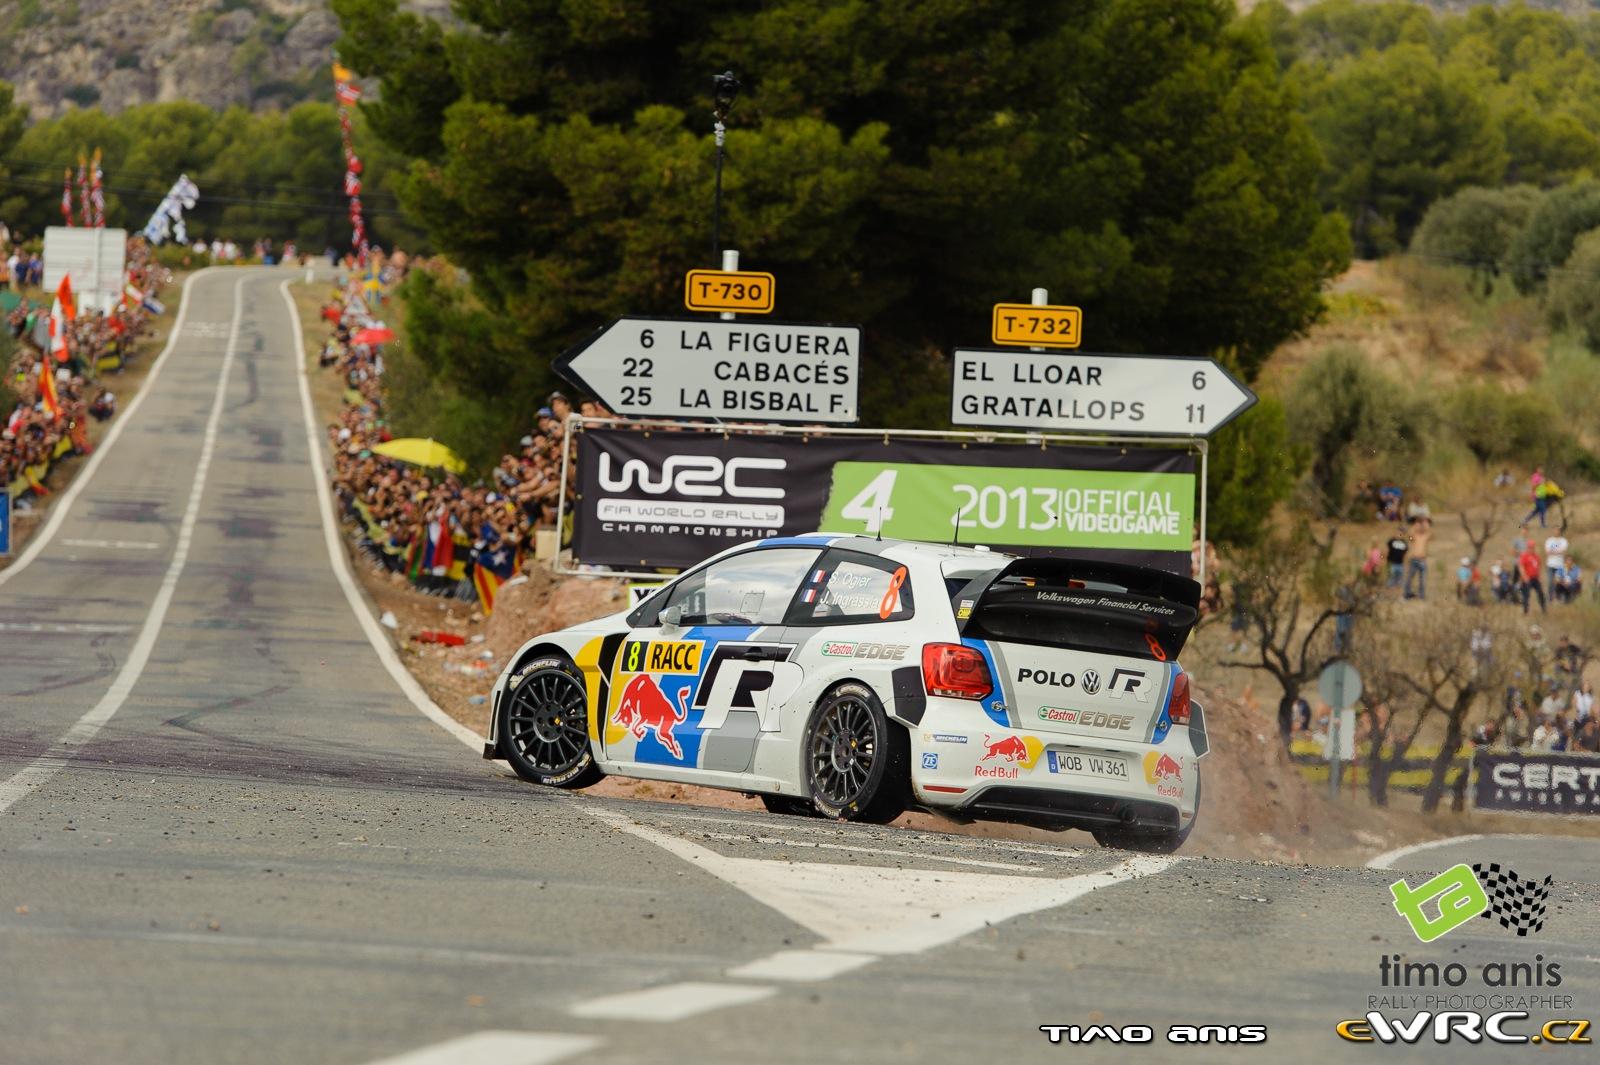 Photo of WRC İspanya Rallisi Fotoğraf Albümü